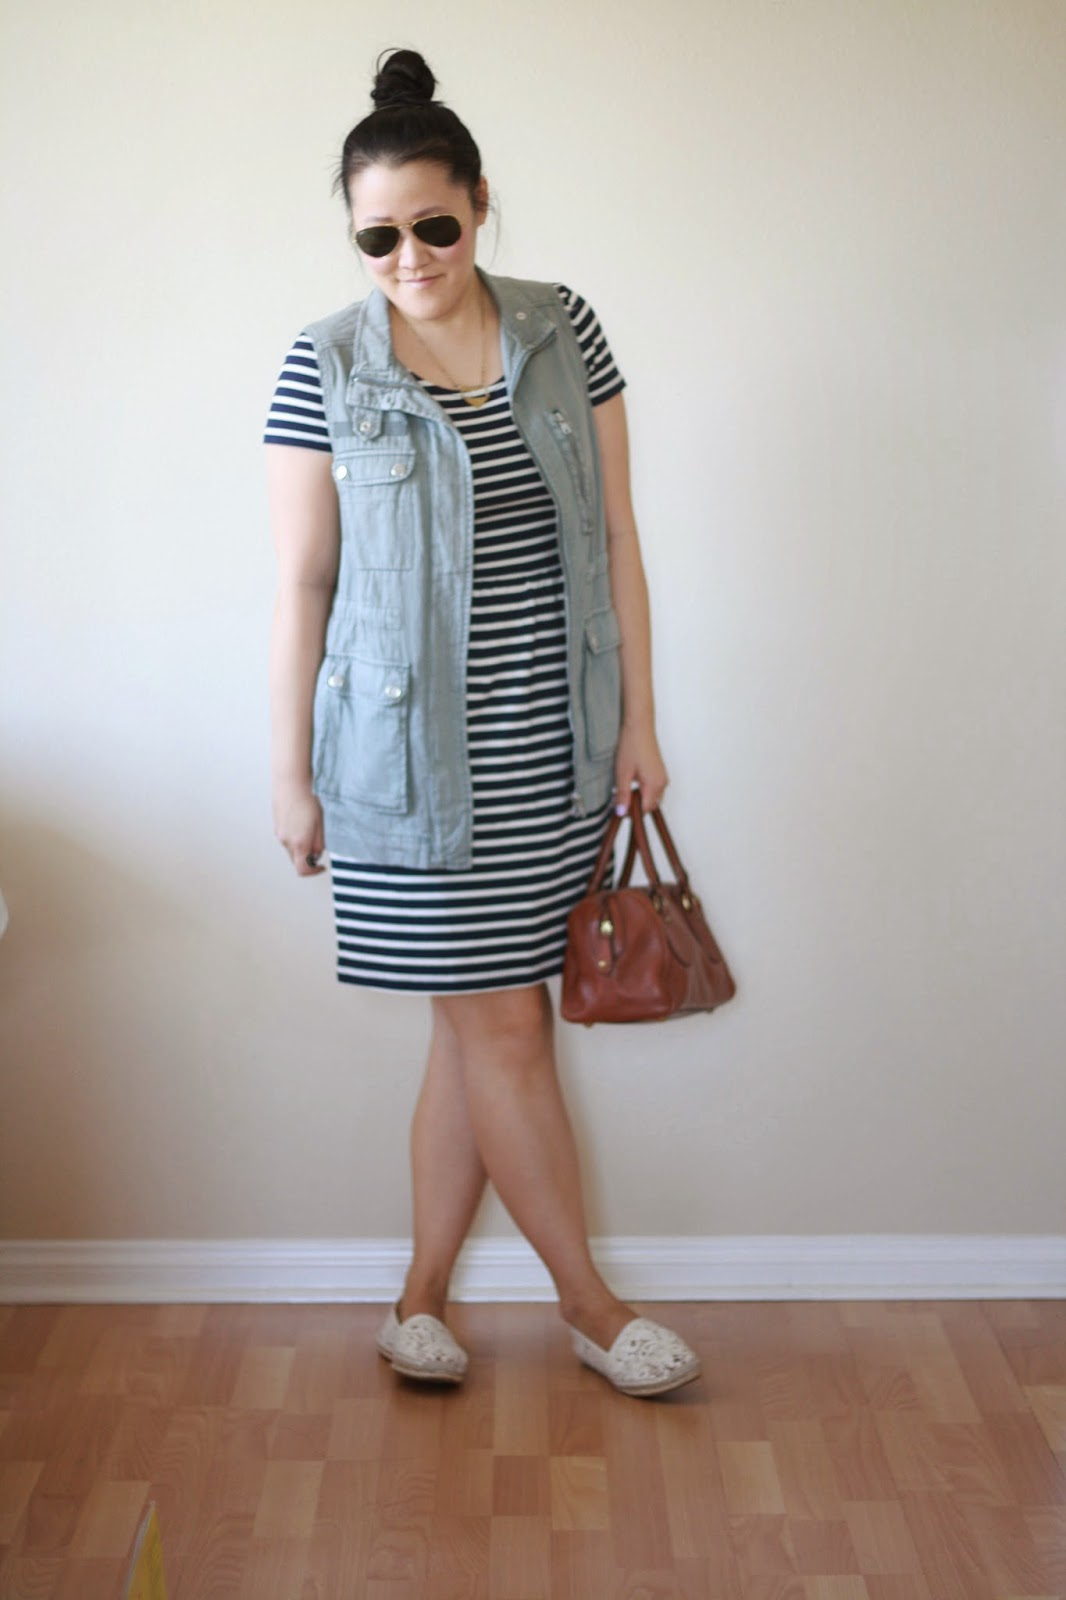 blogger, style blogger, fashion blogger, preppy blogger, ootd, cargo vest, utility vest